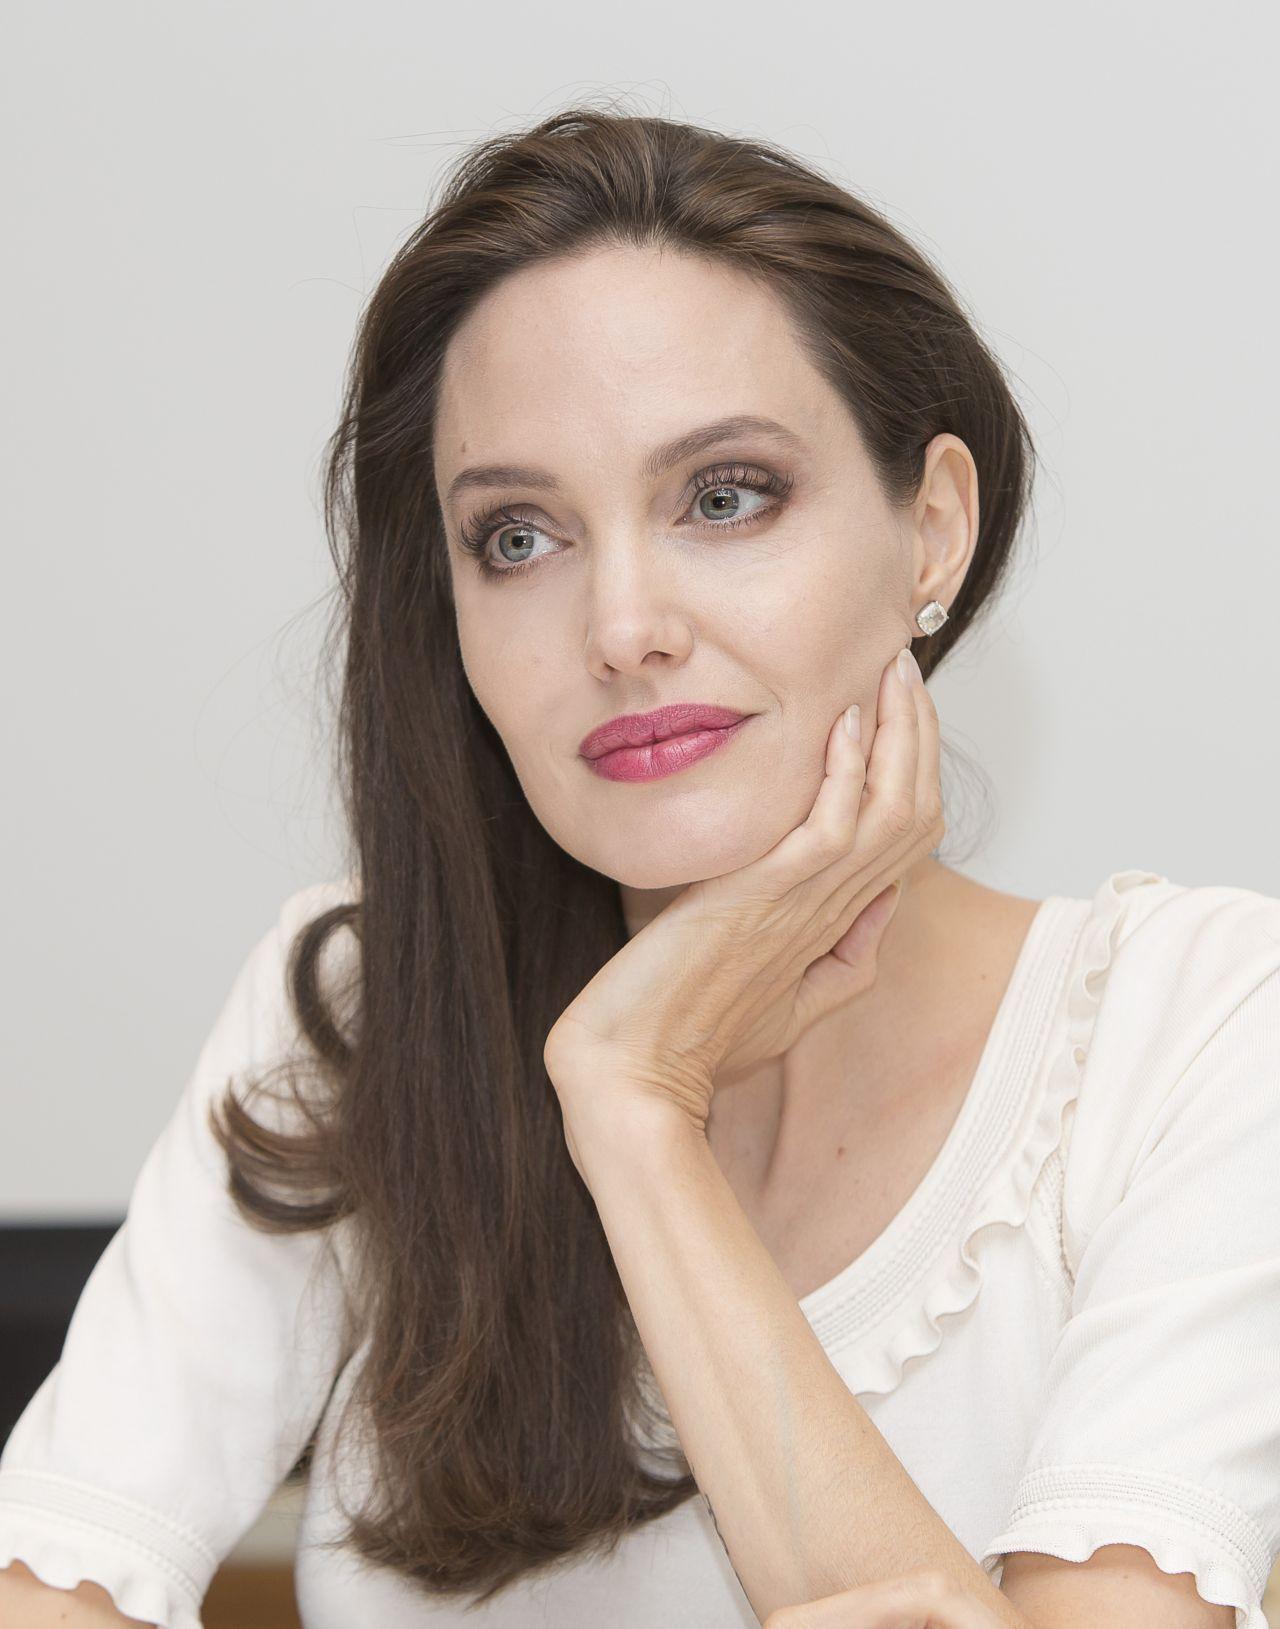 Pin by analia ribeiro on * Angelina * | Celebrities in the